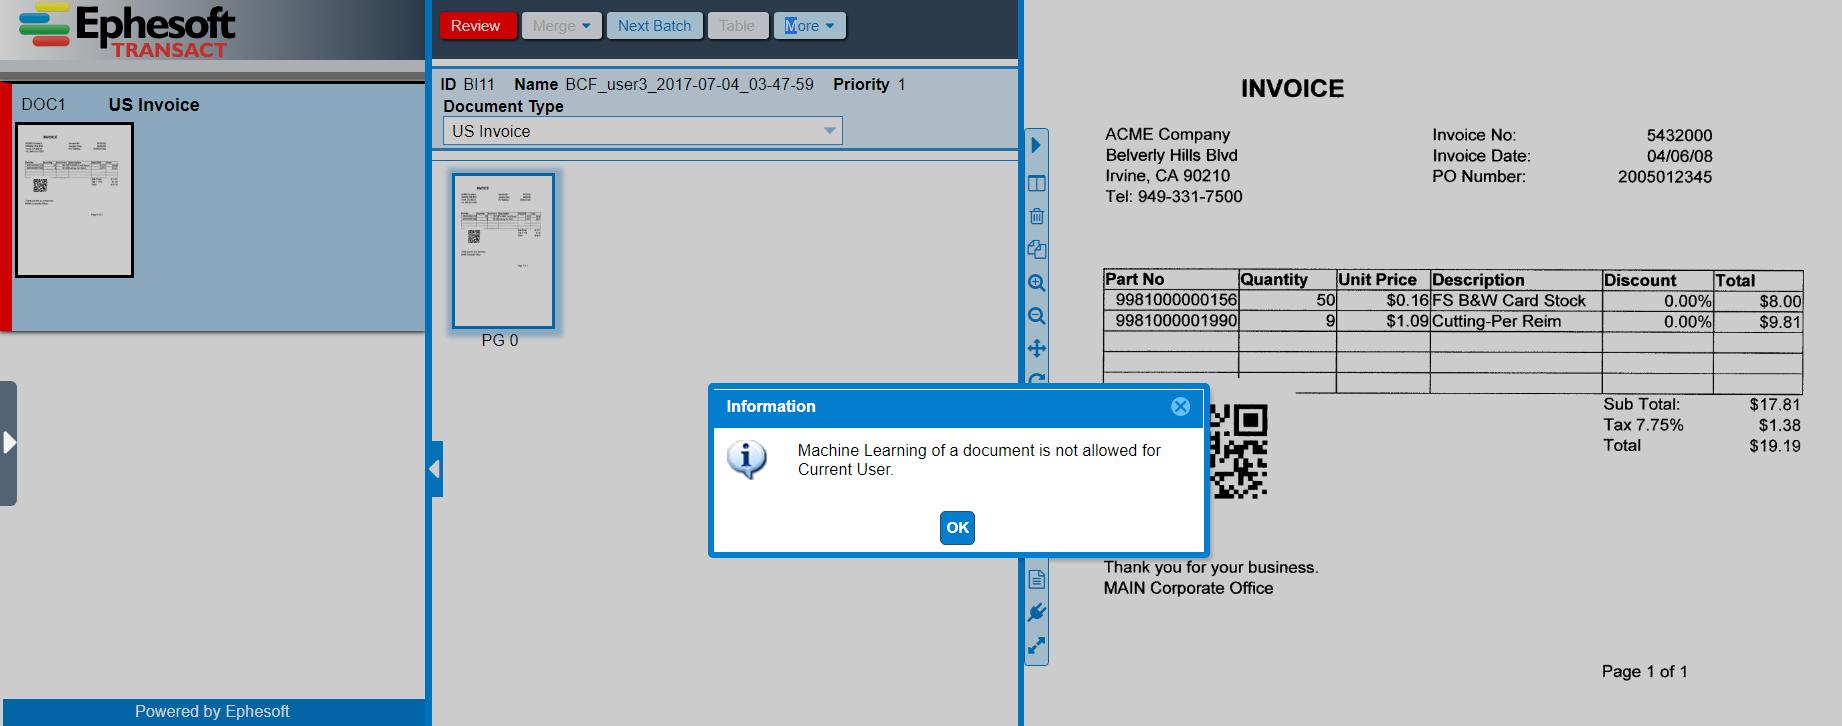 C:UsersEphesoftAppDataLocalMicrosoftWindowsINetCacheContent.Wordmlreview.png